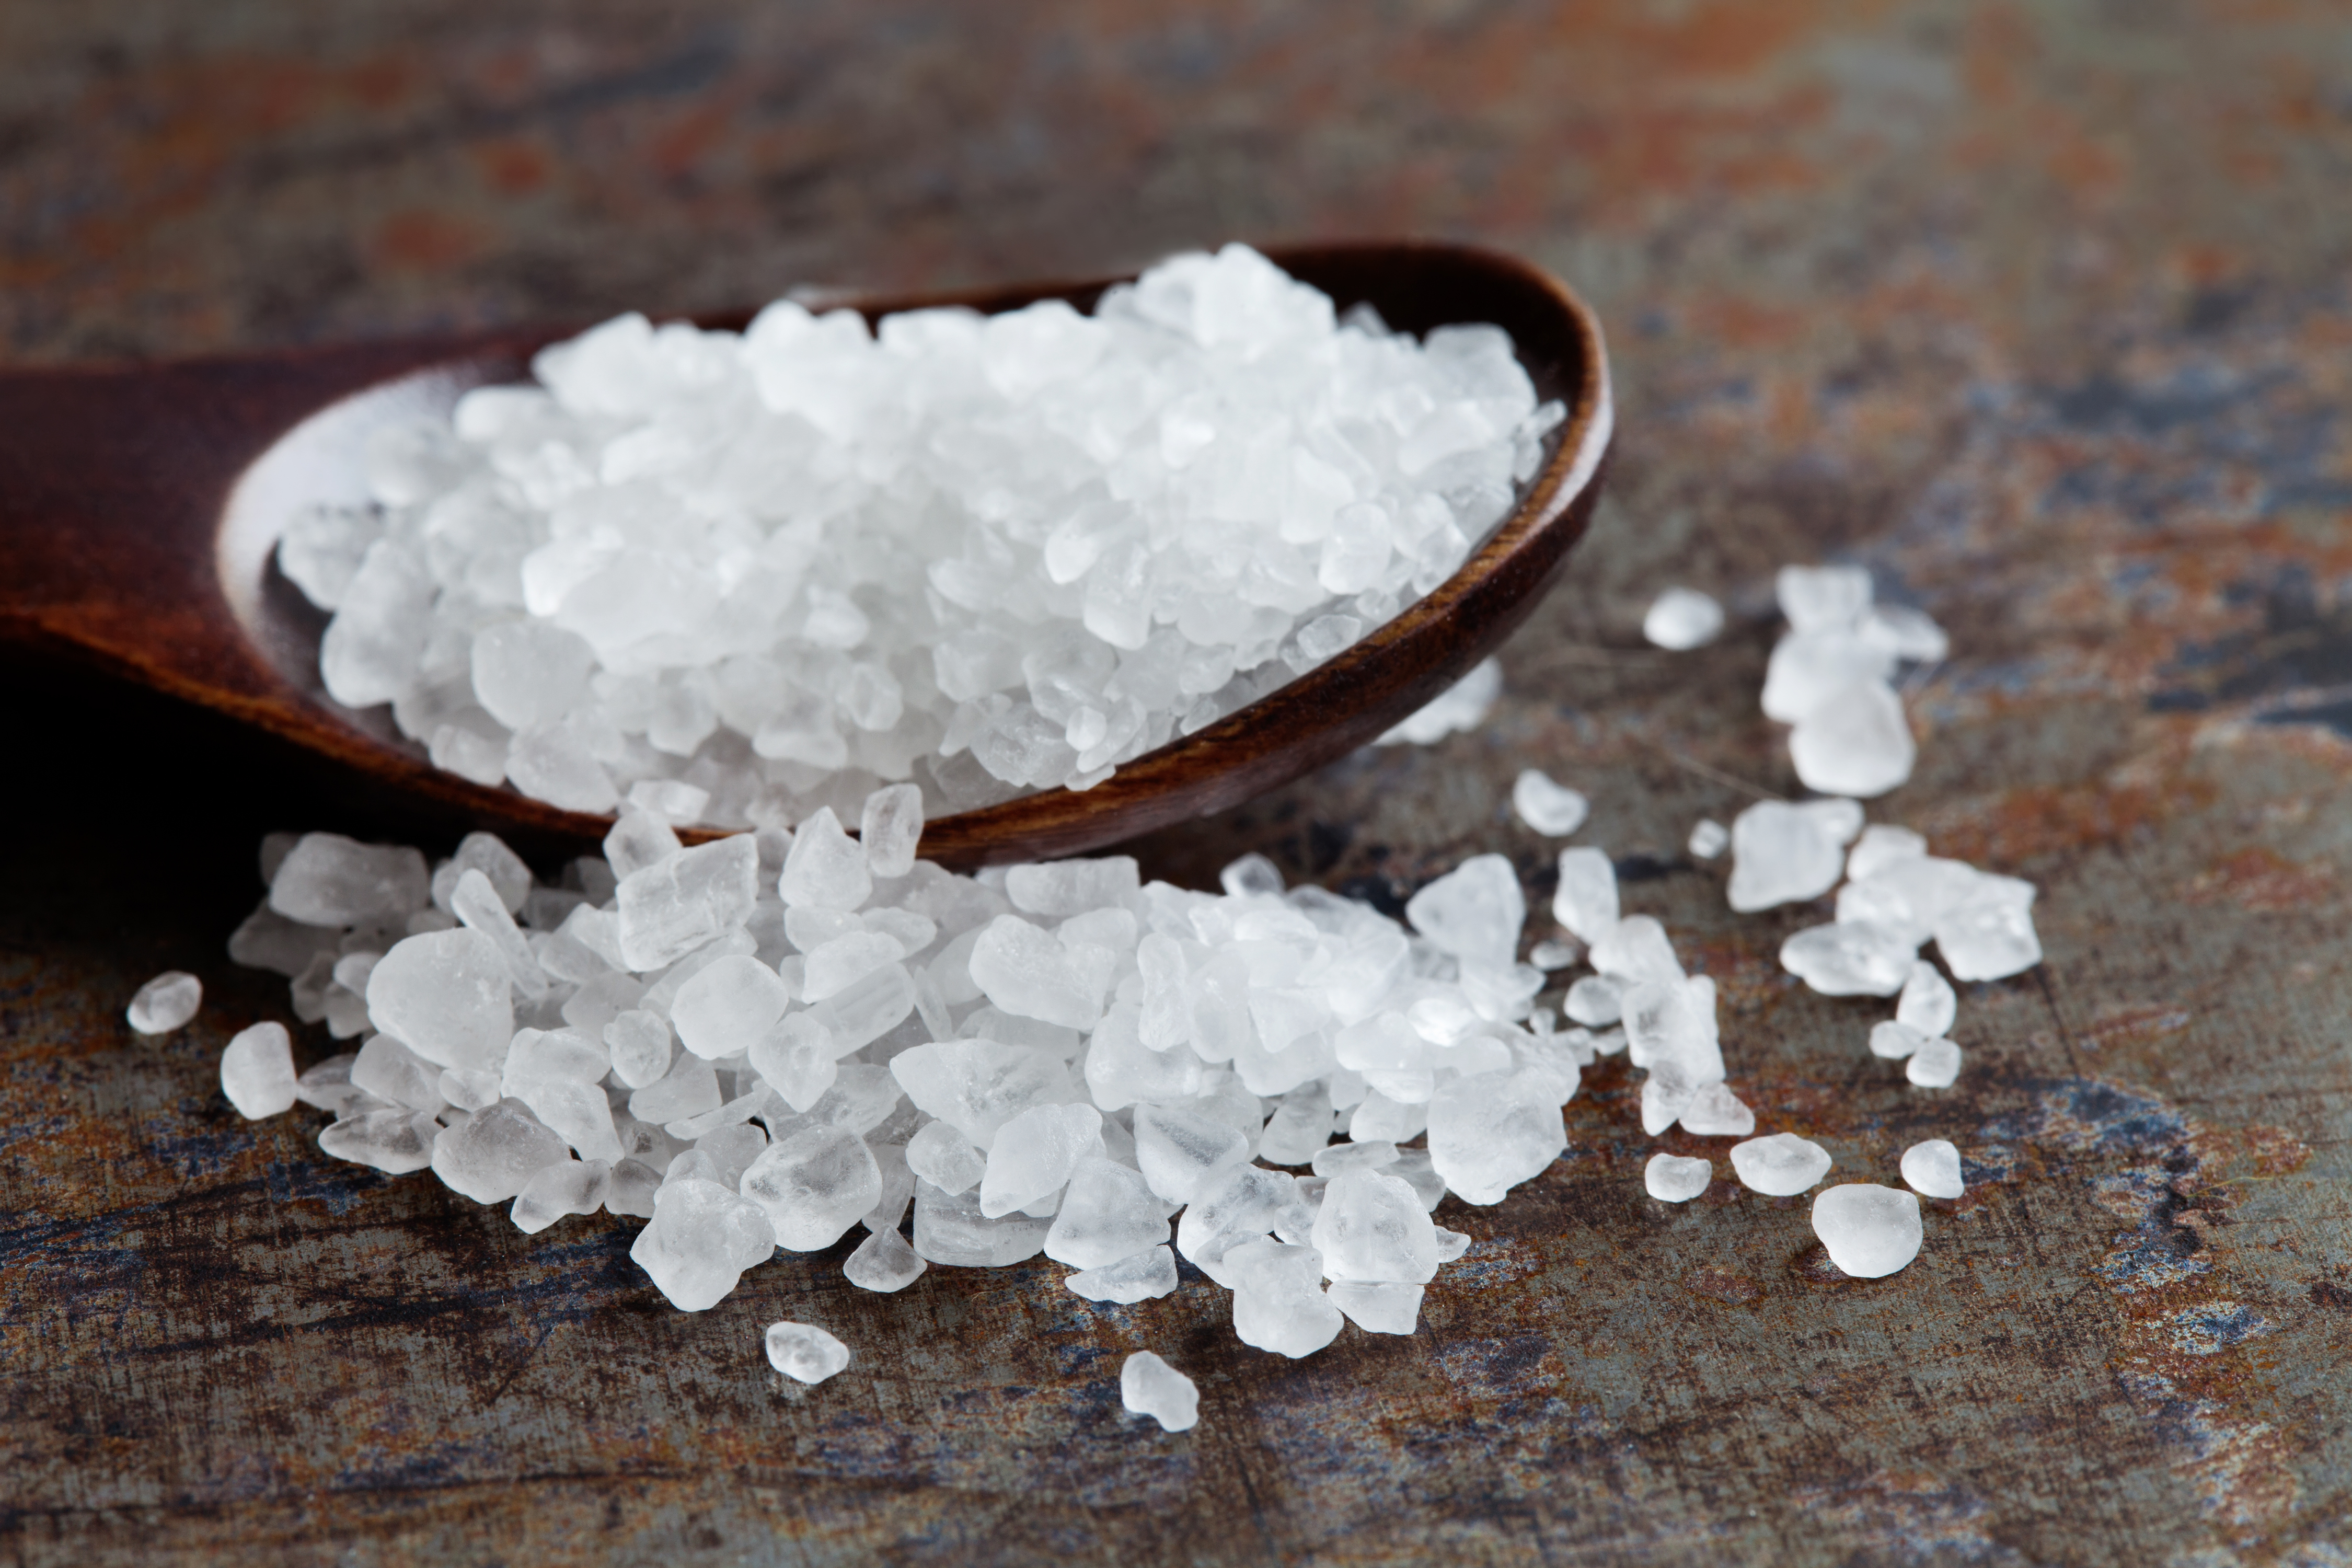 Rock Salt Vs Table Salt To Melt Ice